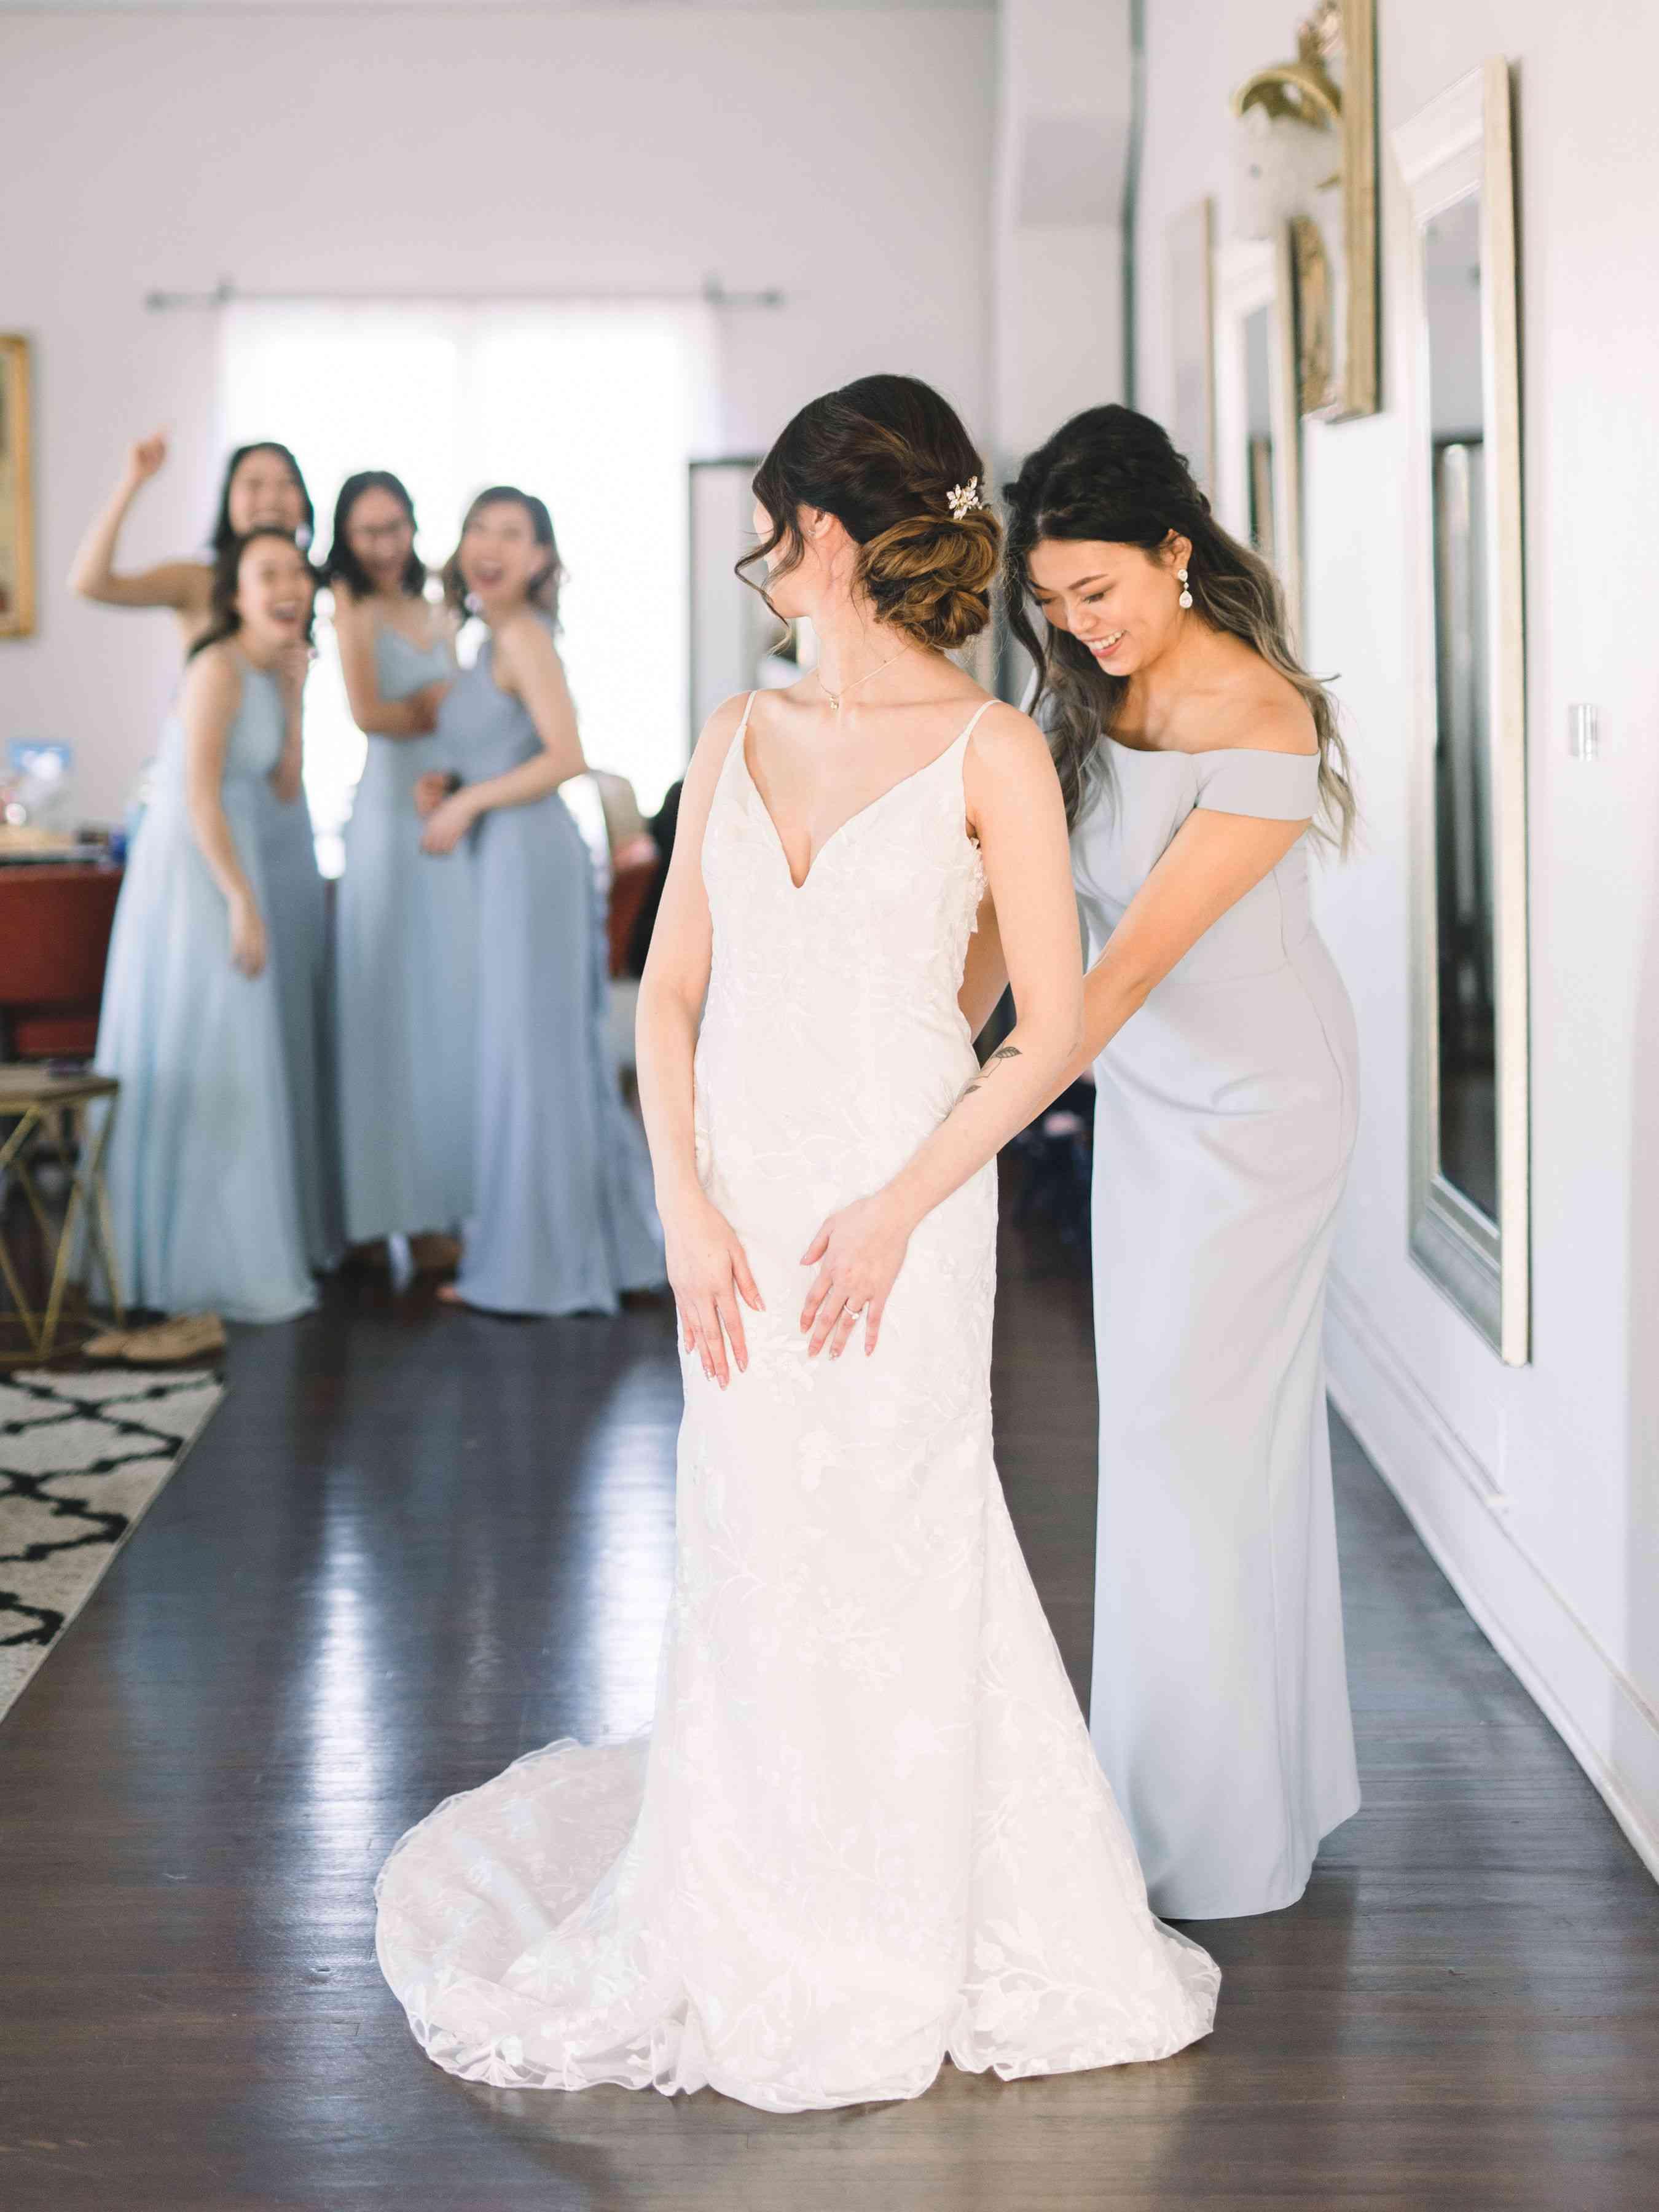 bridesmaid zipping brides dress